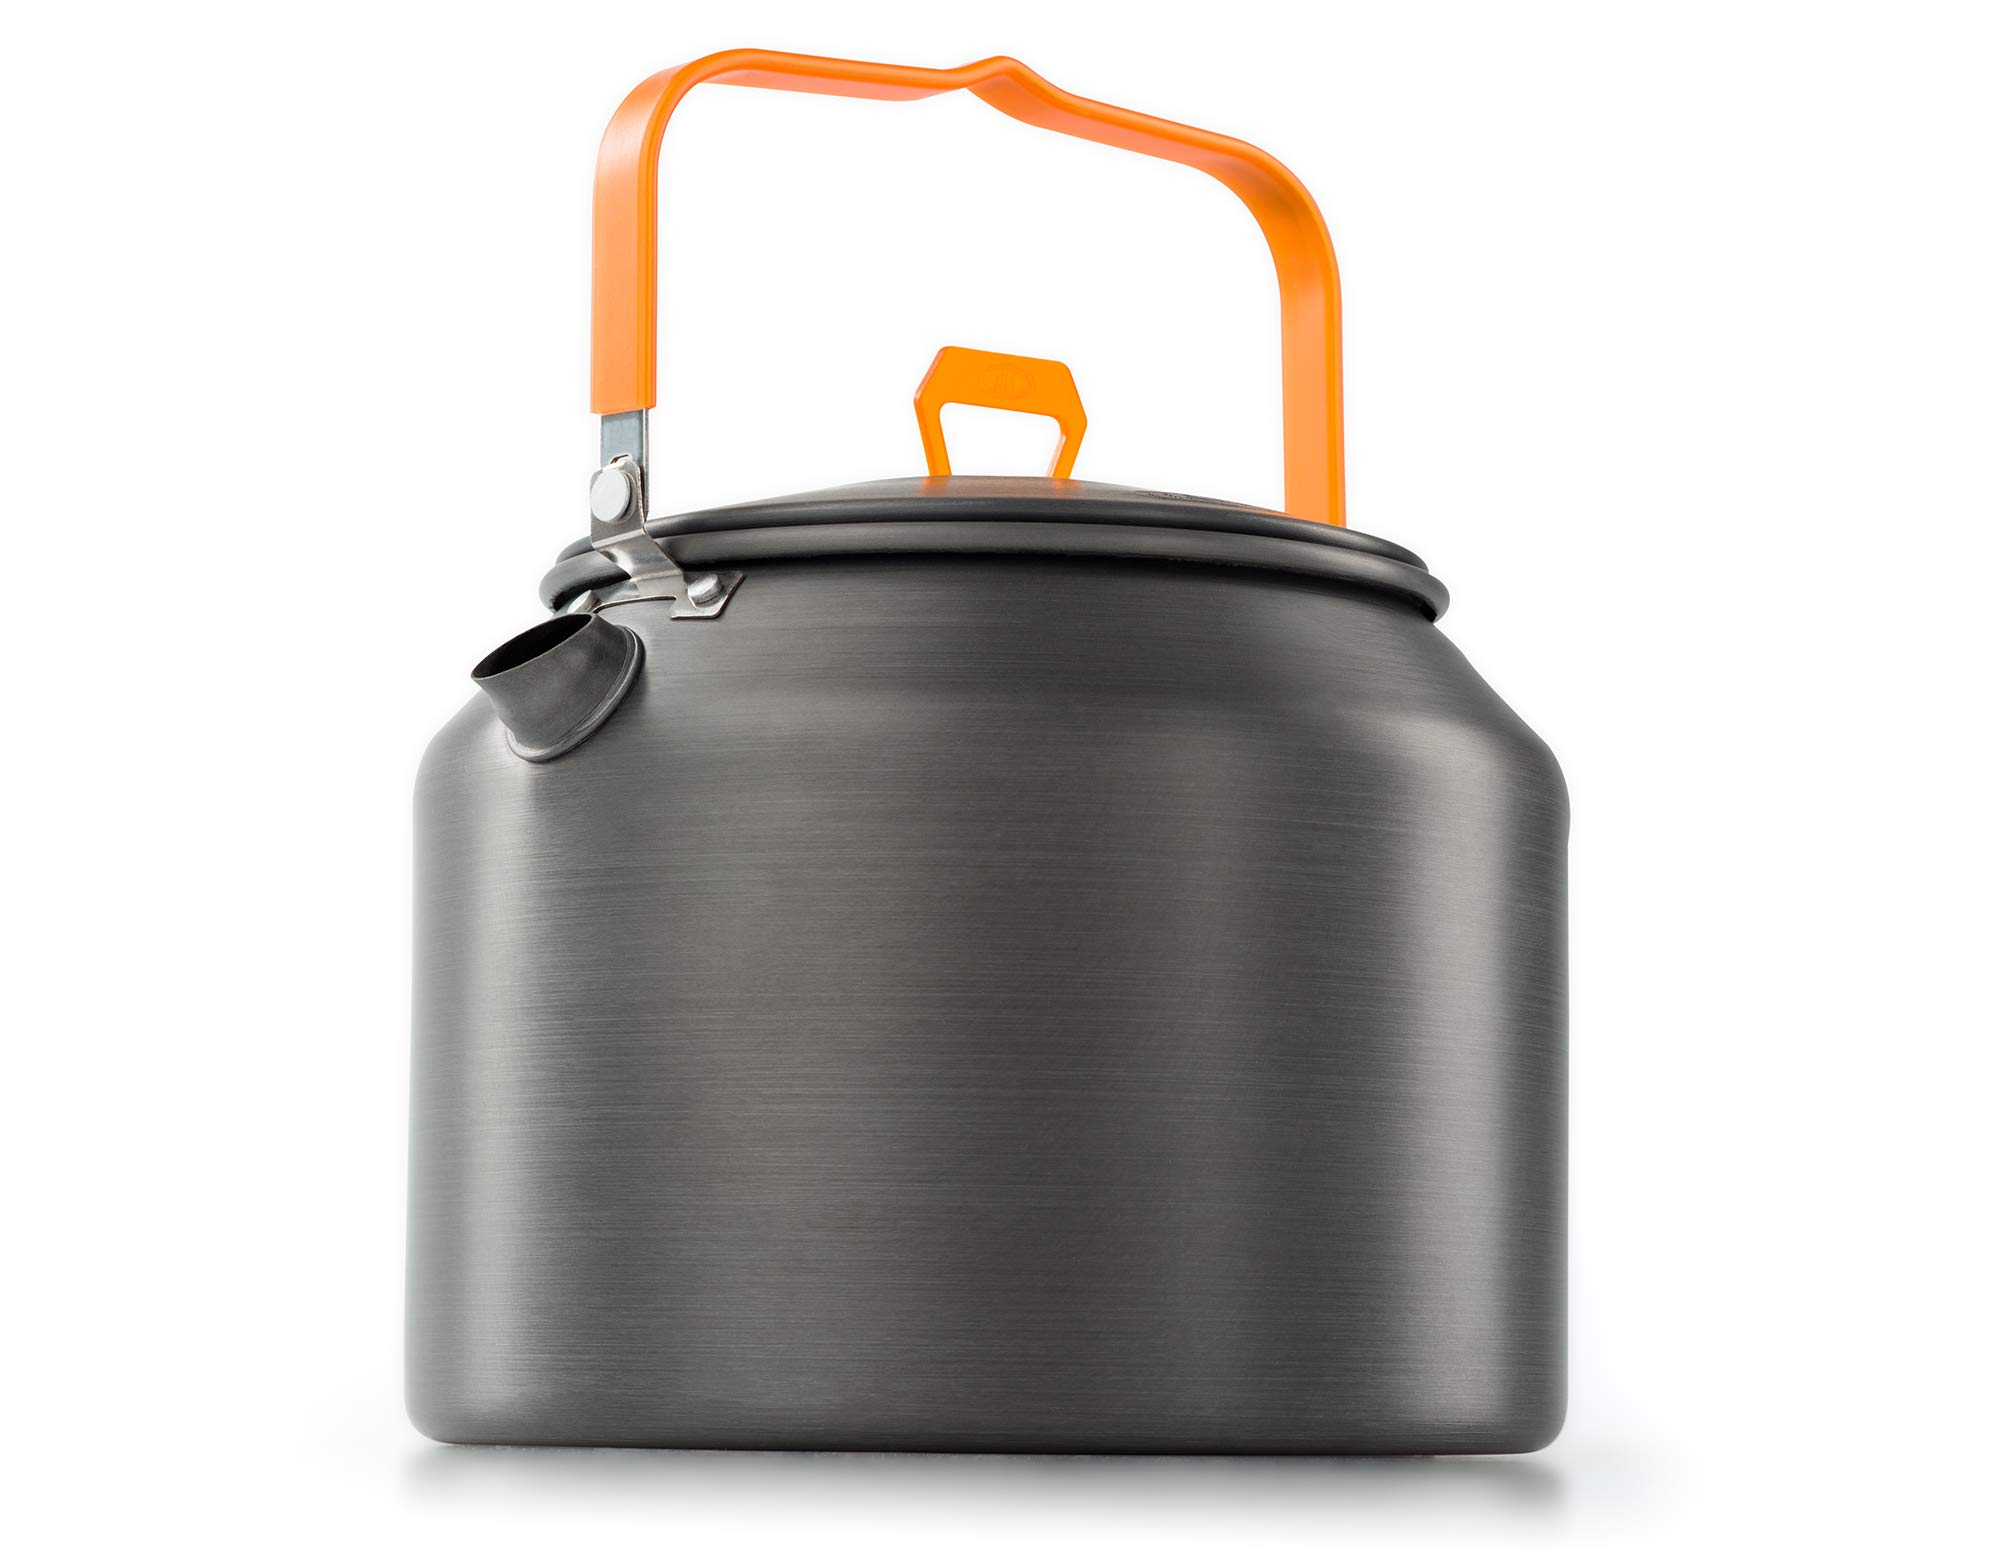 GSI Outdoors Halulite Tea Kettle 1.8 qt.